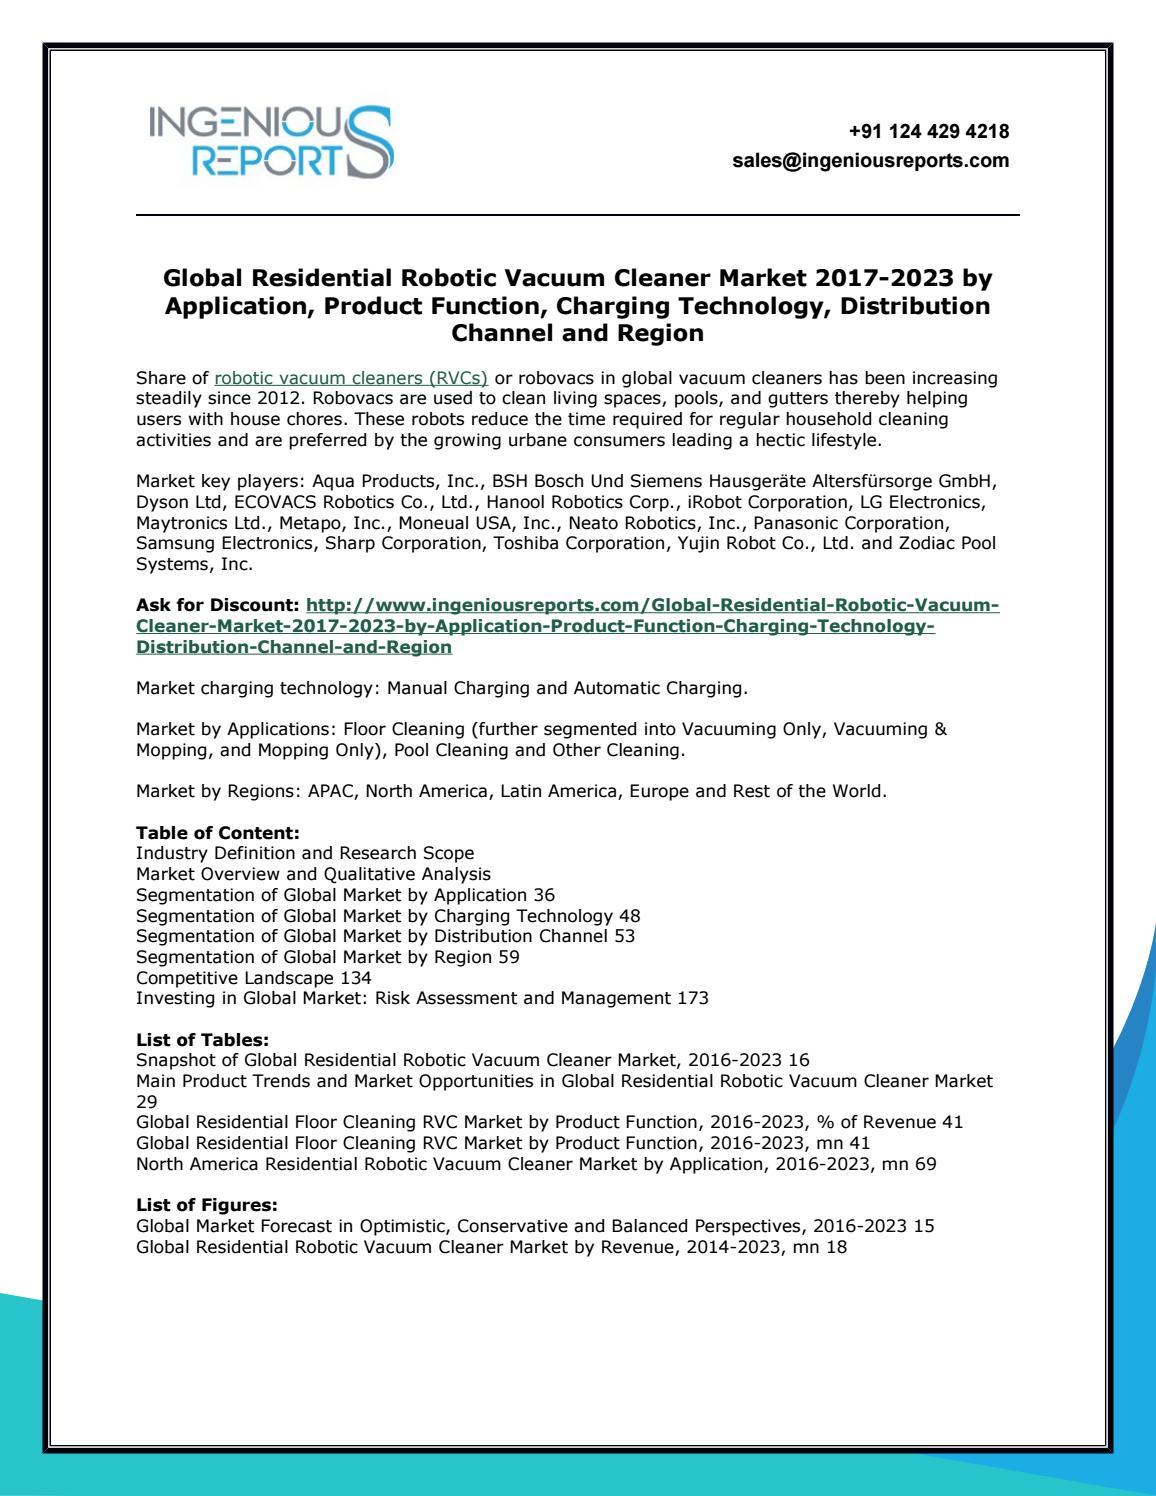 Zodiac Pool Care Europe residential robotic vacuum cleaner global market trends